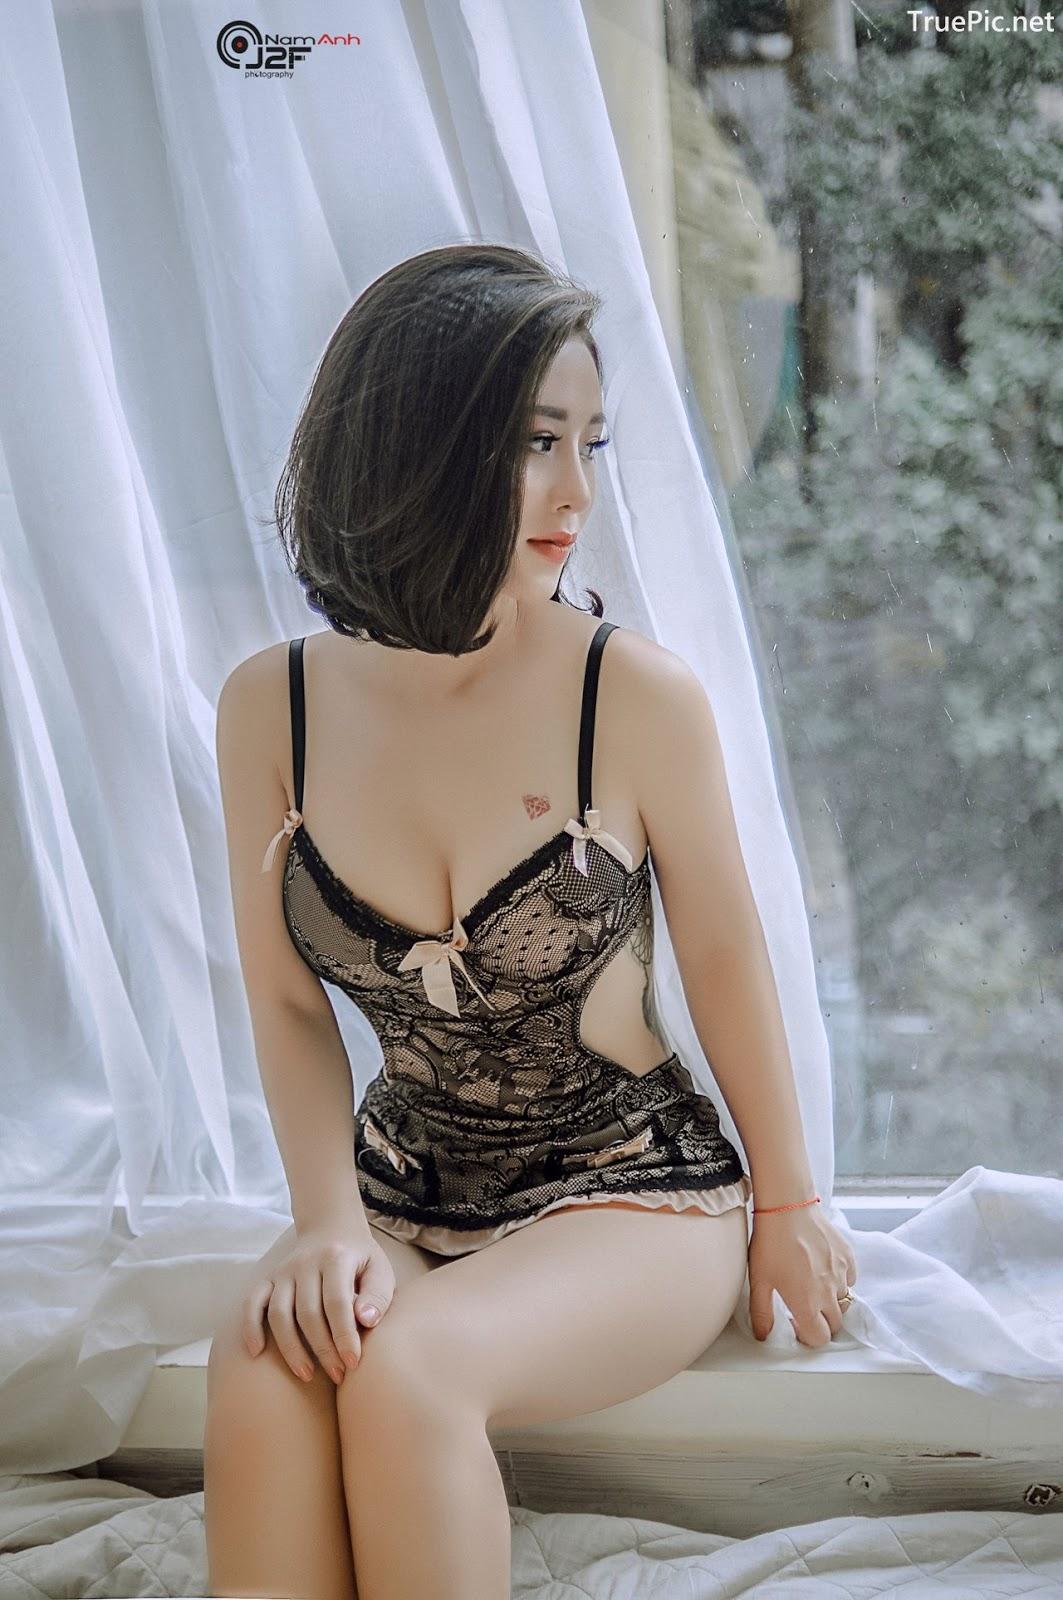 Image Vietnamese Model – Sexy Beauty of Beautiful Girls Taken by NamAnh Photo #6 - TruePic.net - Picture-1